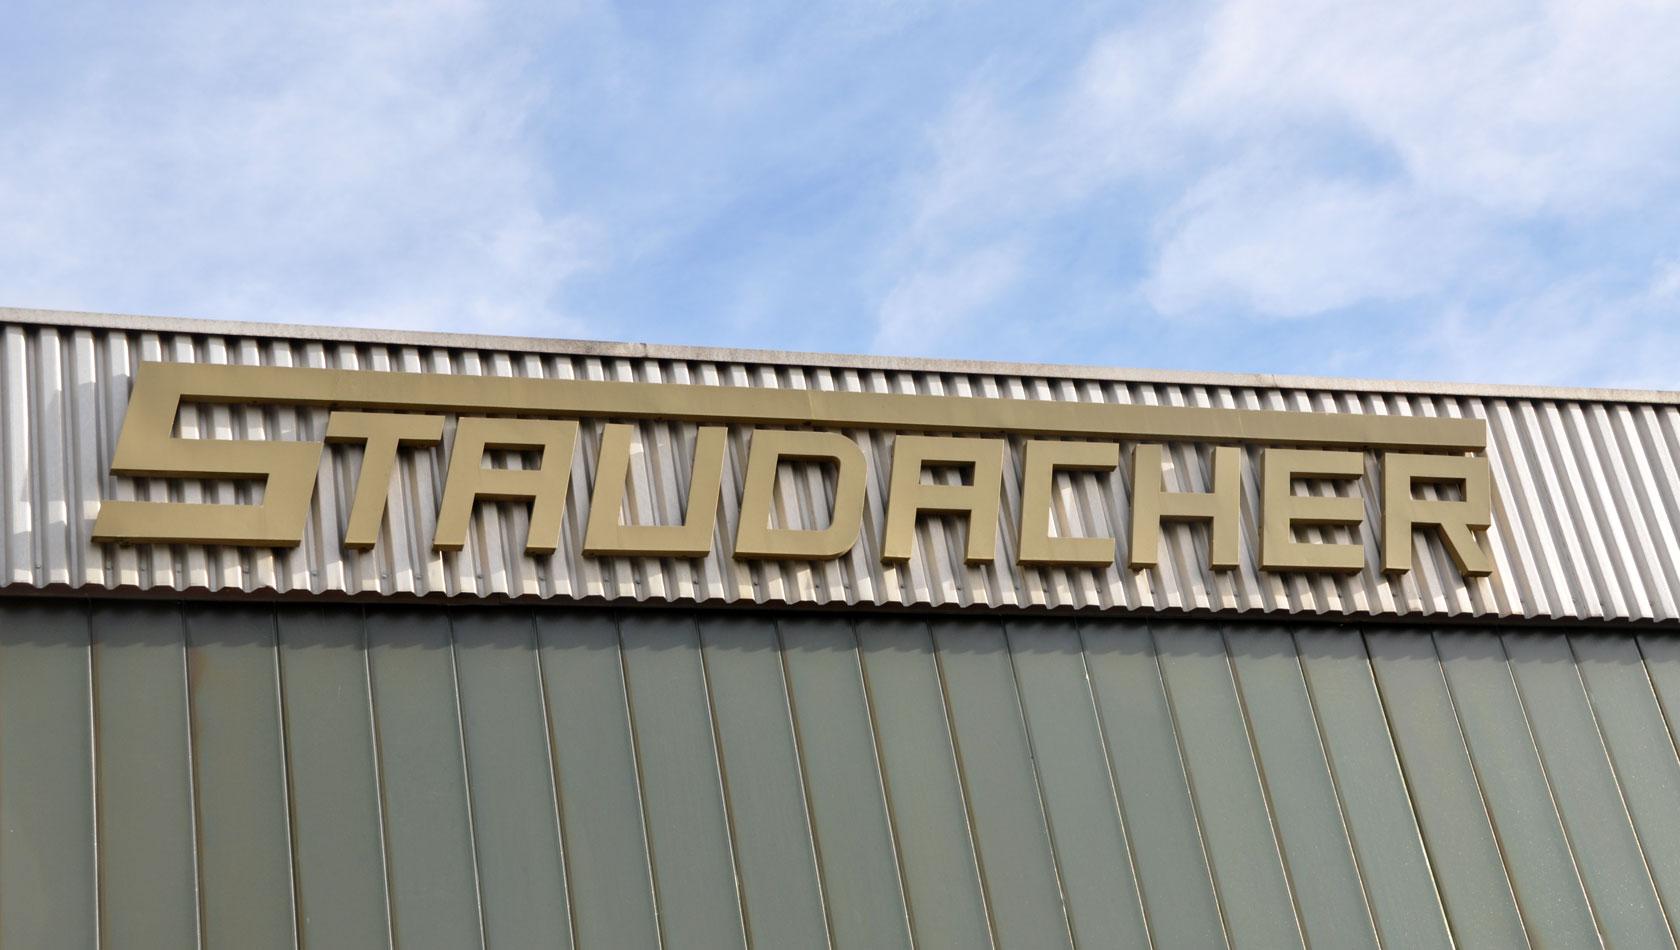 Firmenname